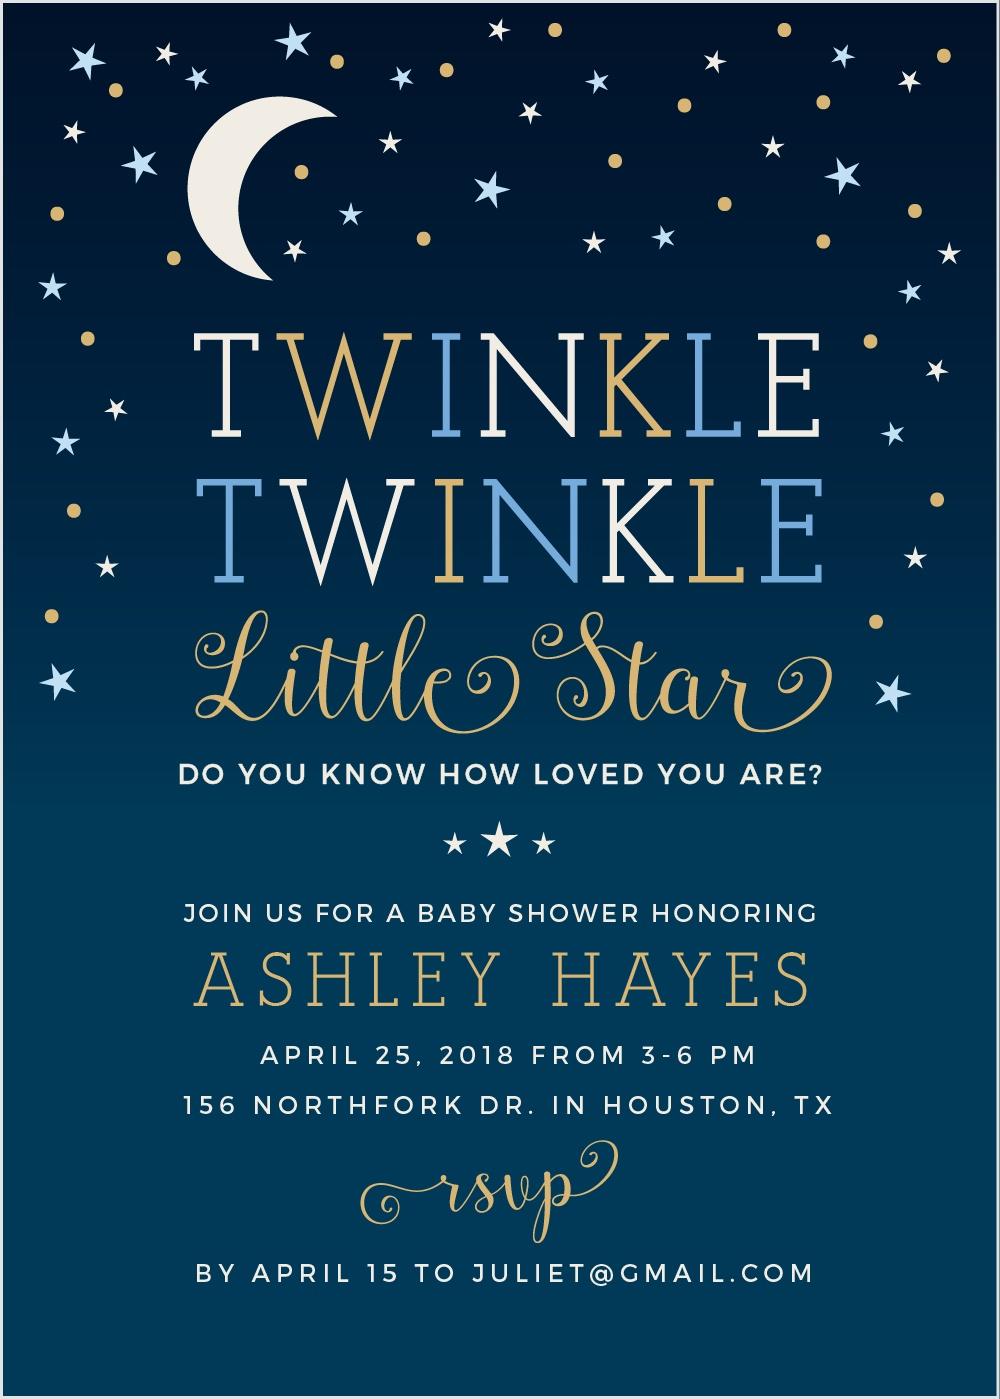 Twinkle twinkle little star inspired baby shower featuring basic twinkle twinkle little star baby shower invitations filmwisefo